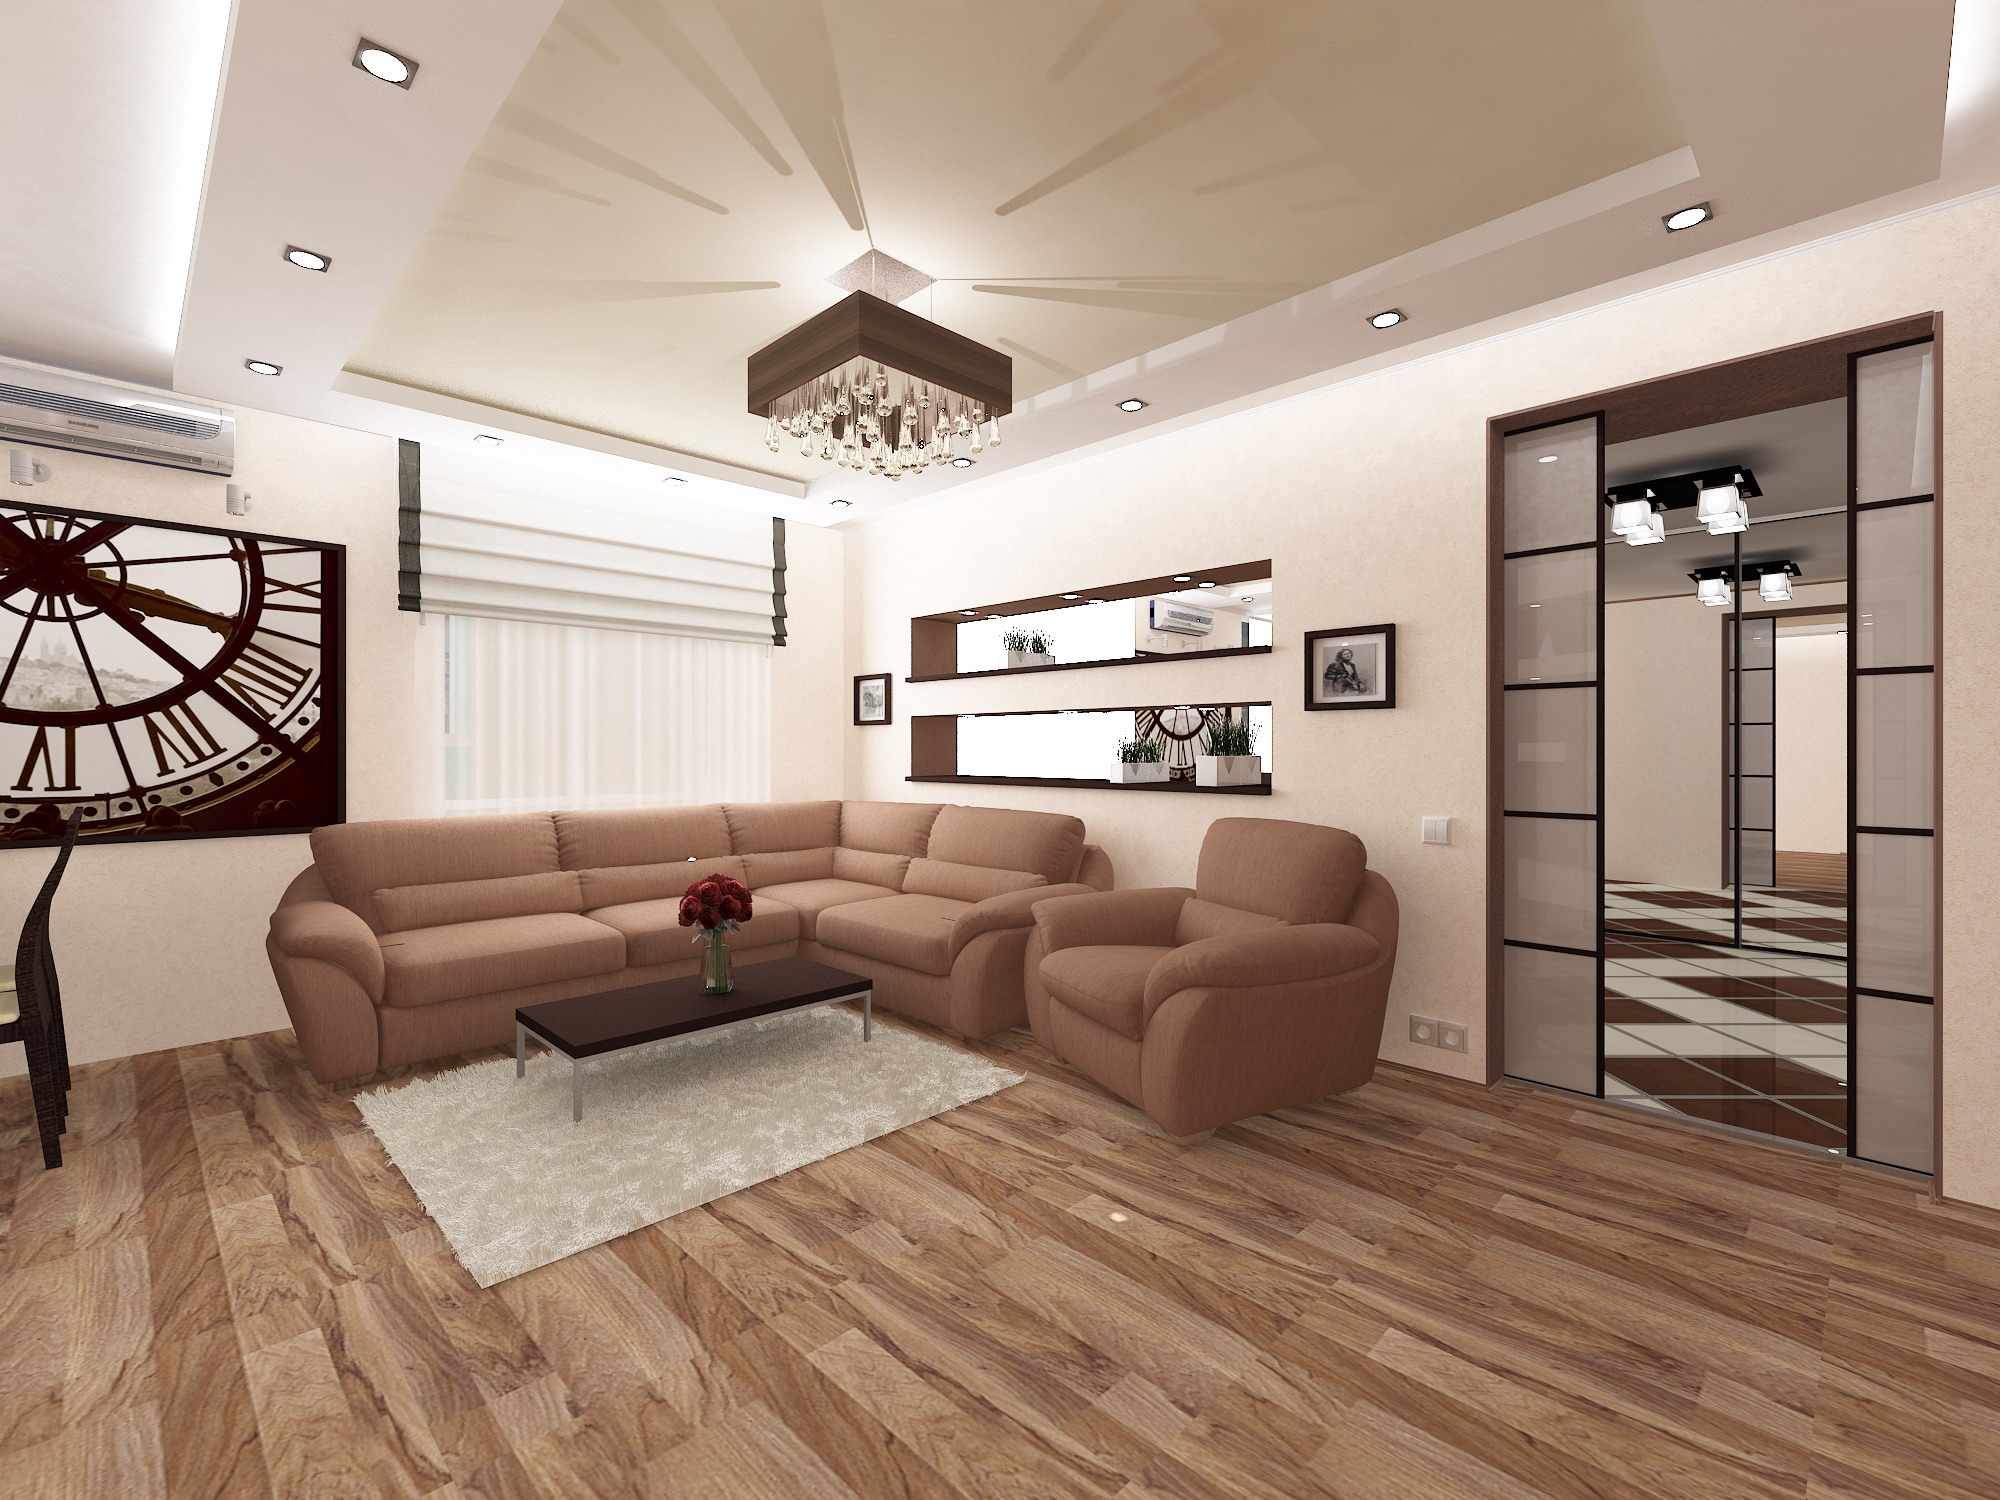 Дизайн квартиры 58 кв.м двухкомнатной